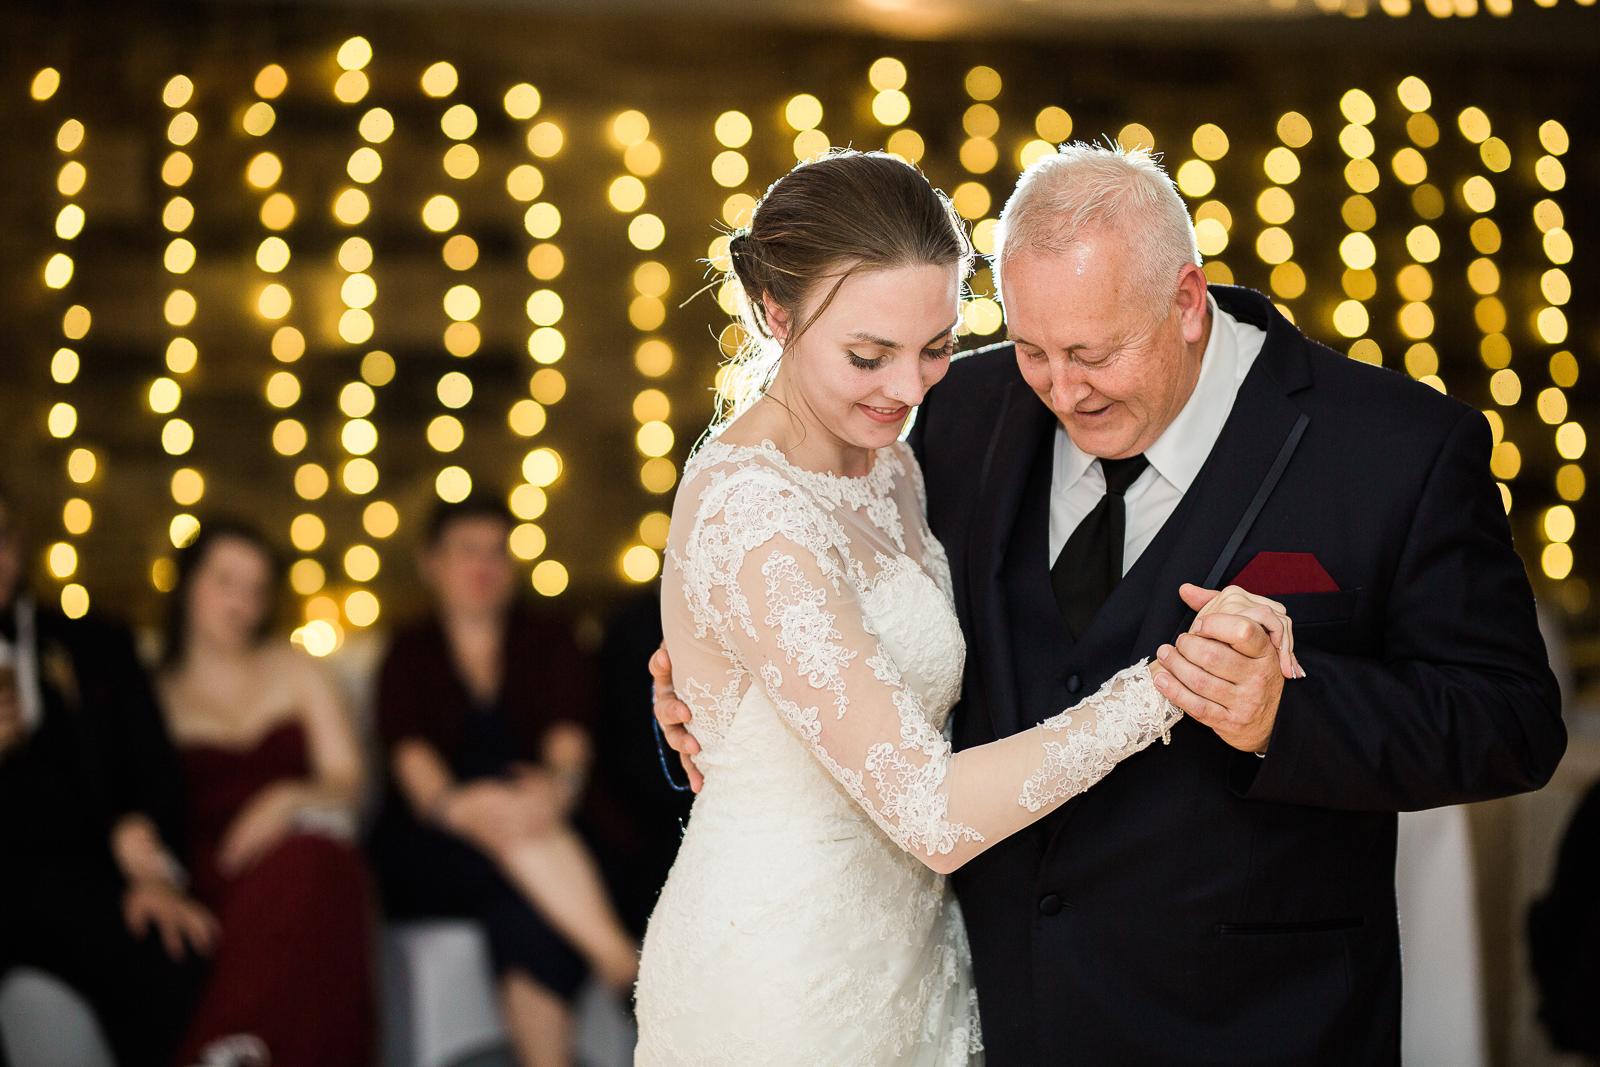 gander-wedding-photographer-148.jpg